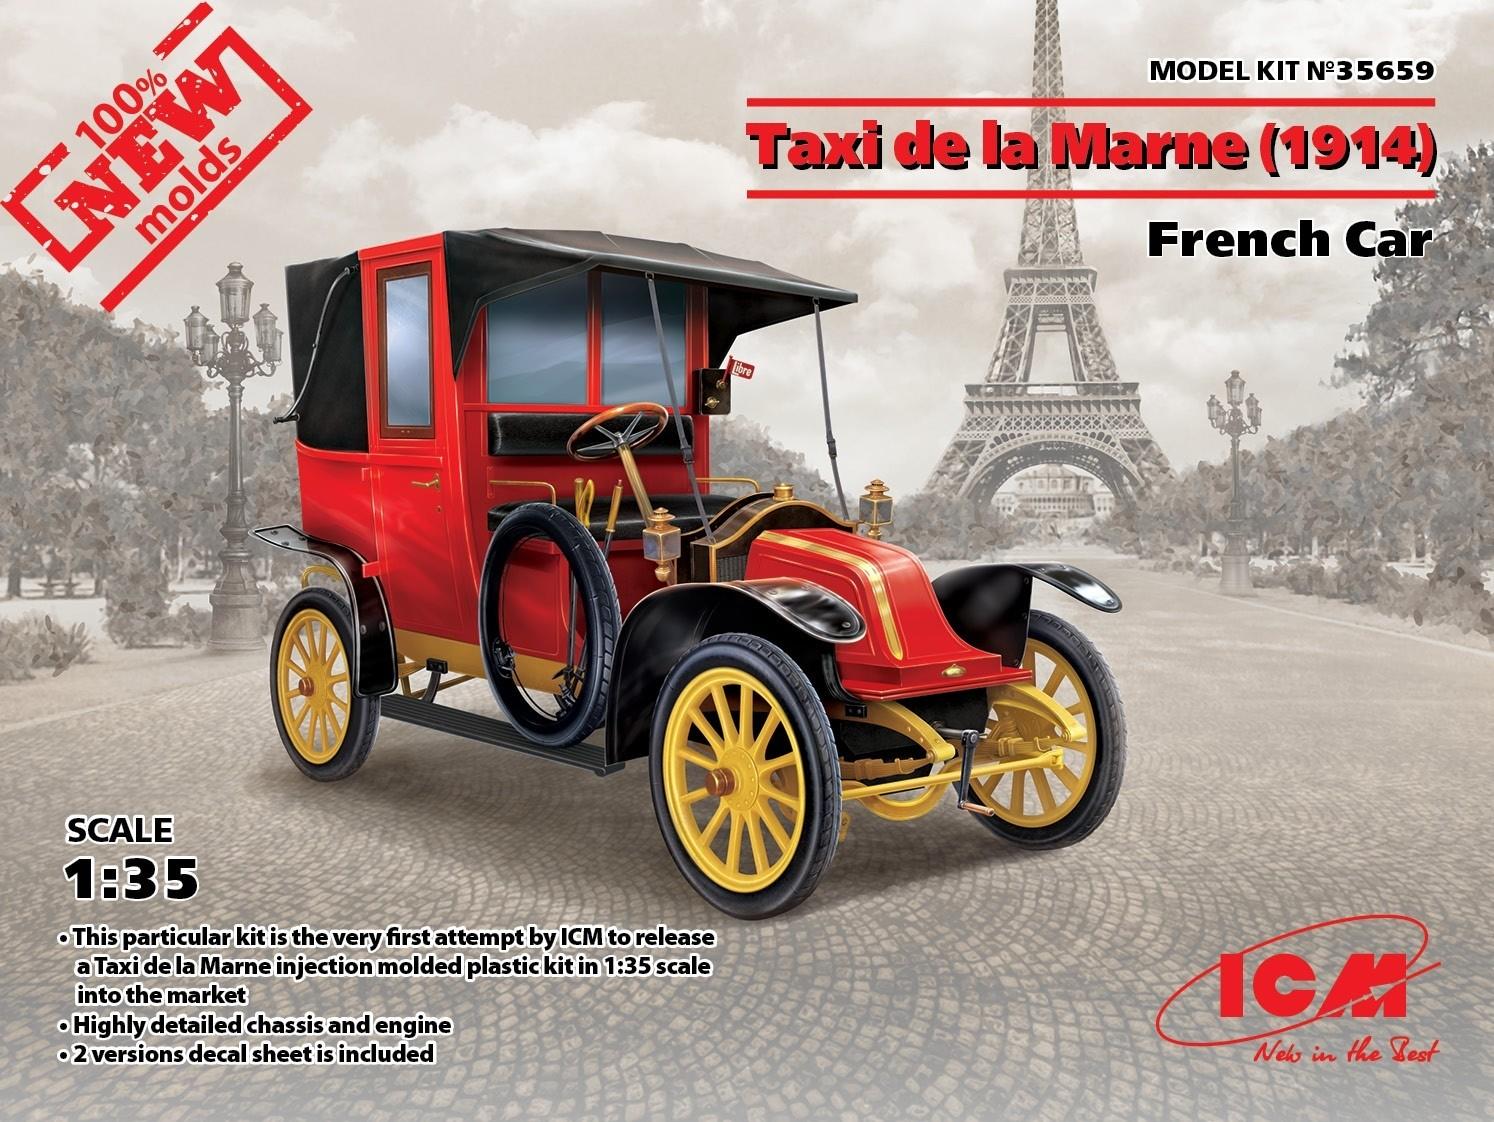 Taxi de la Marne (1914) French Car NEW MOLDS